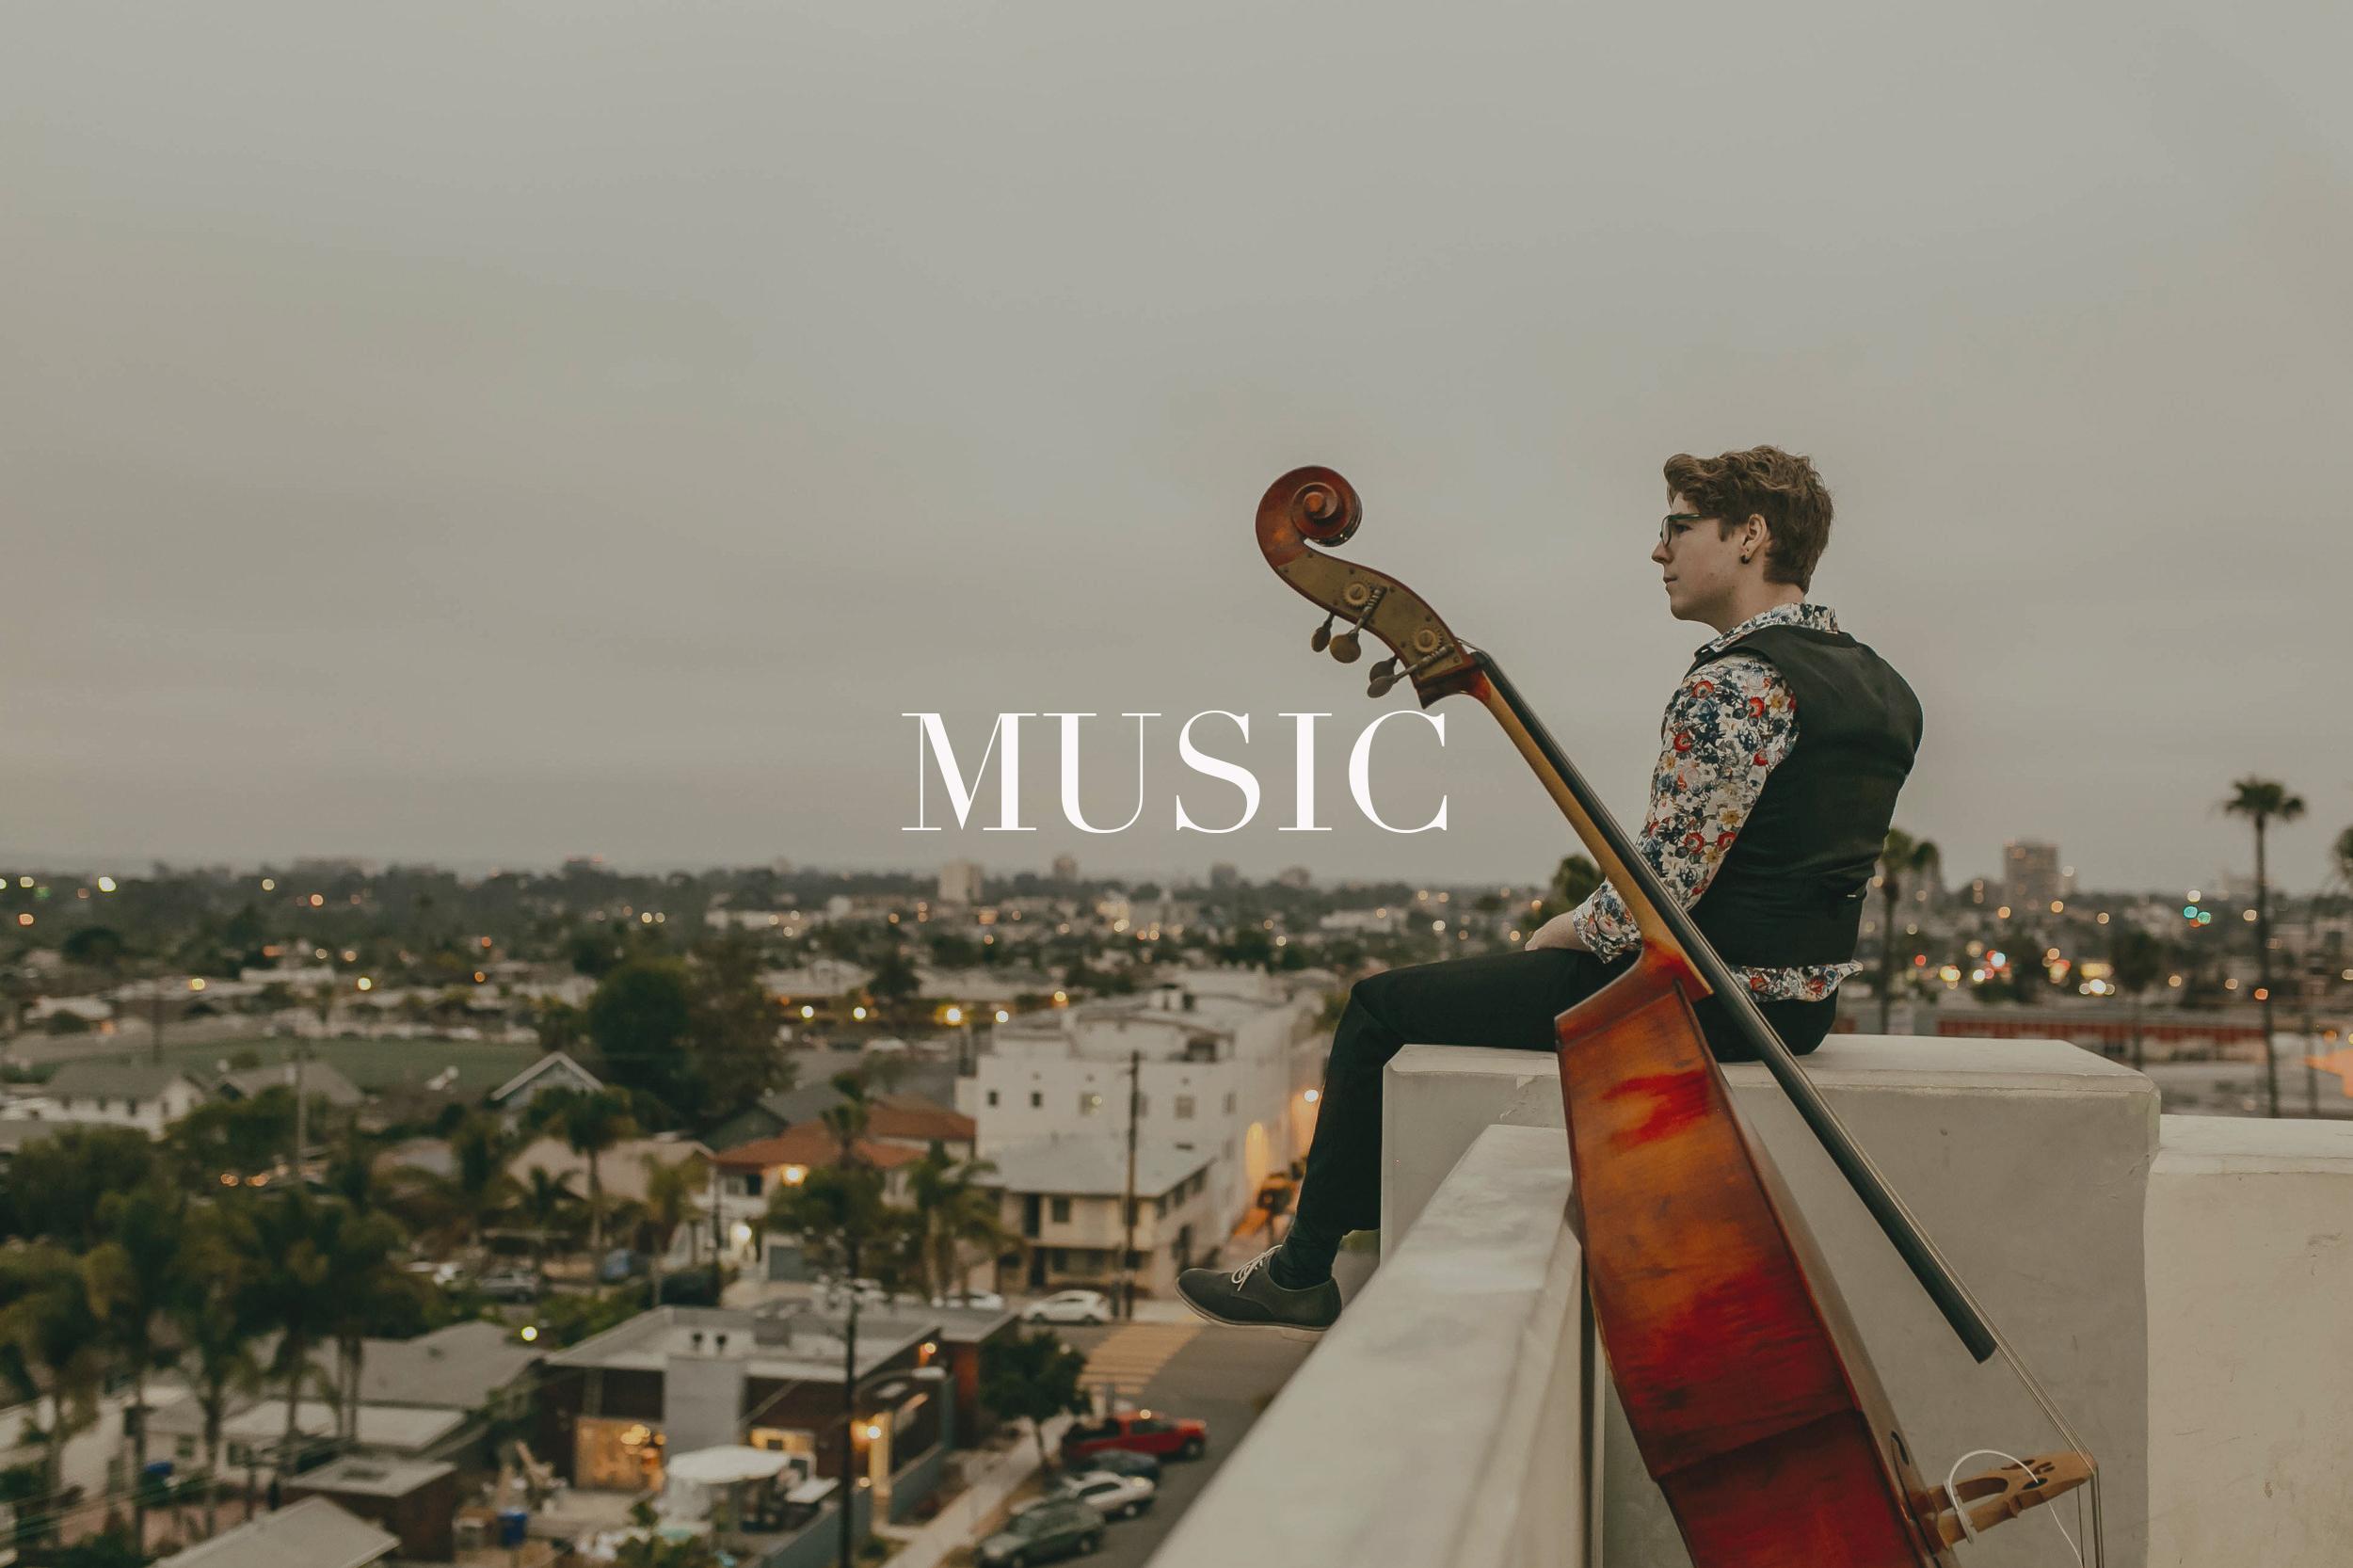 music pic.jpg